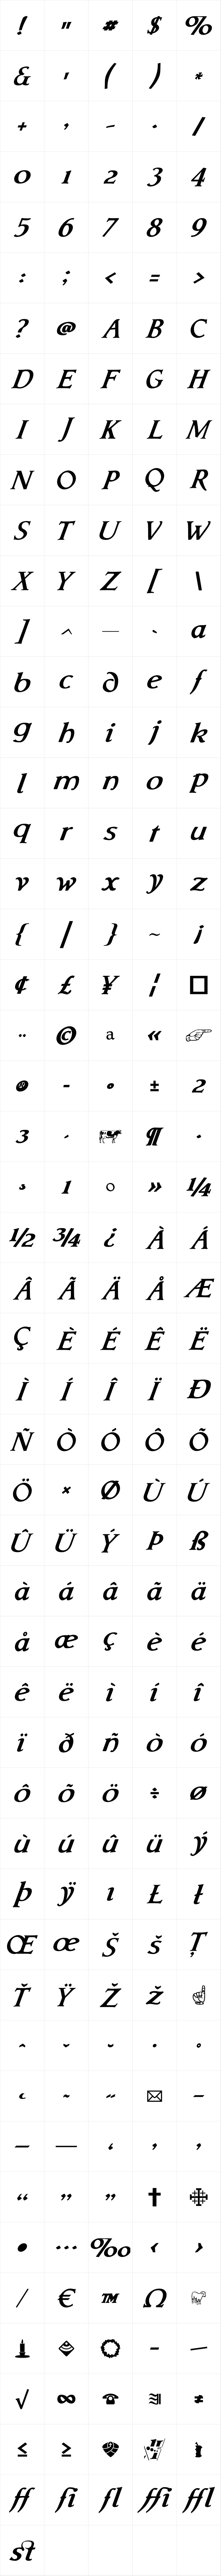 LibrumE BoldItalic